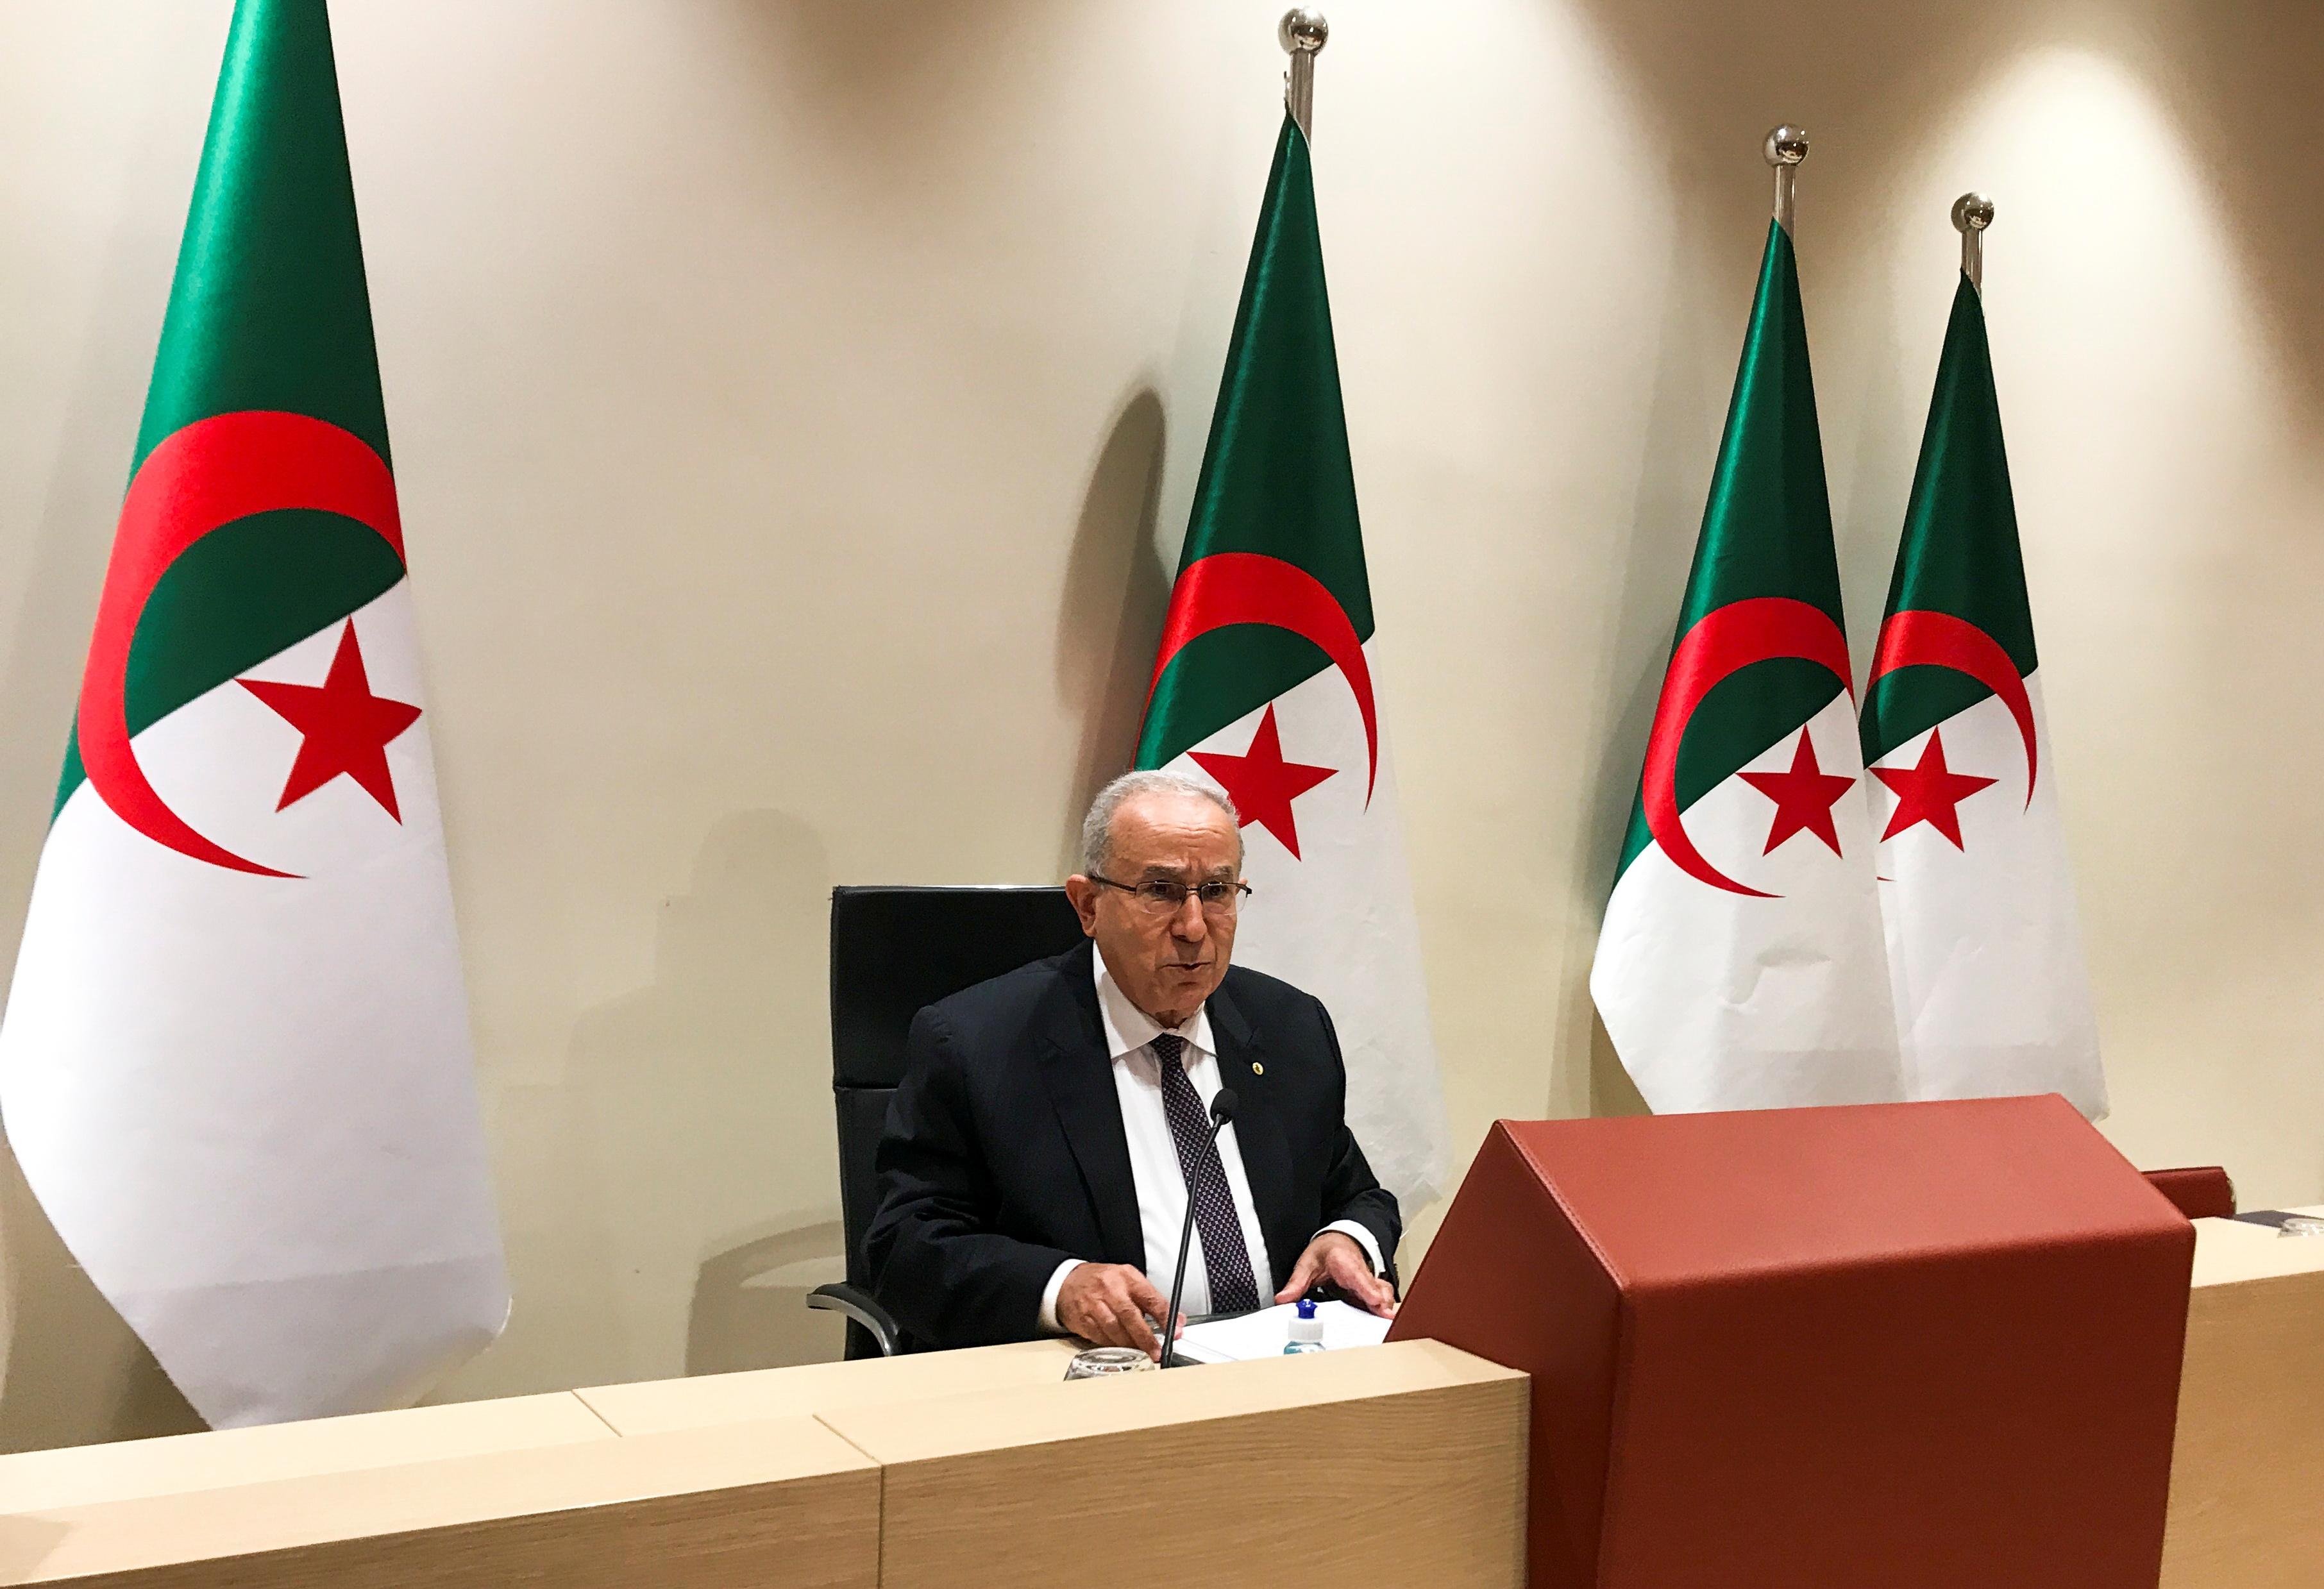 Algeria's Foreign Minister Ramtane Lamamra speaks during a news conference in Algiers, Algeria August 24, 2021. REUTERS/Abdelaziz Boumzar